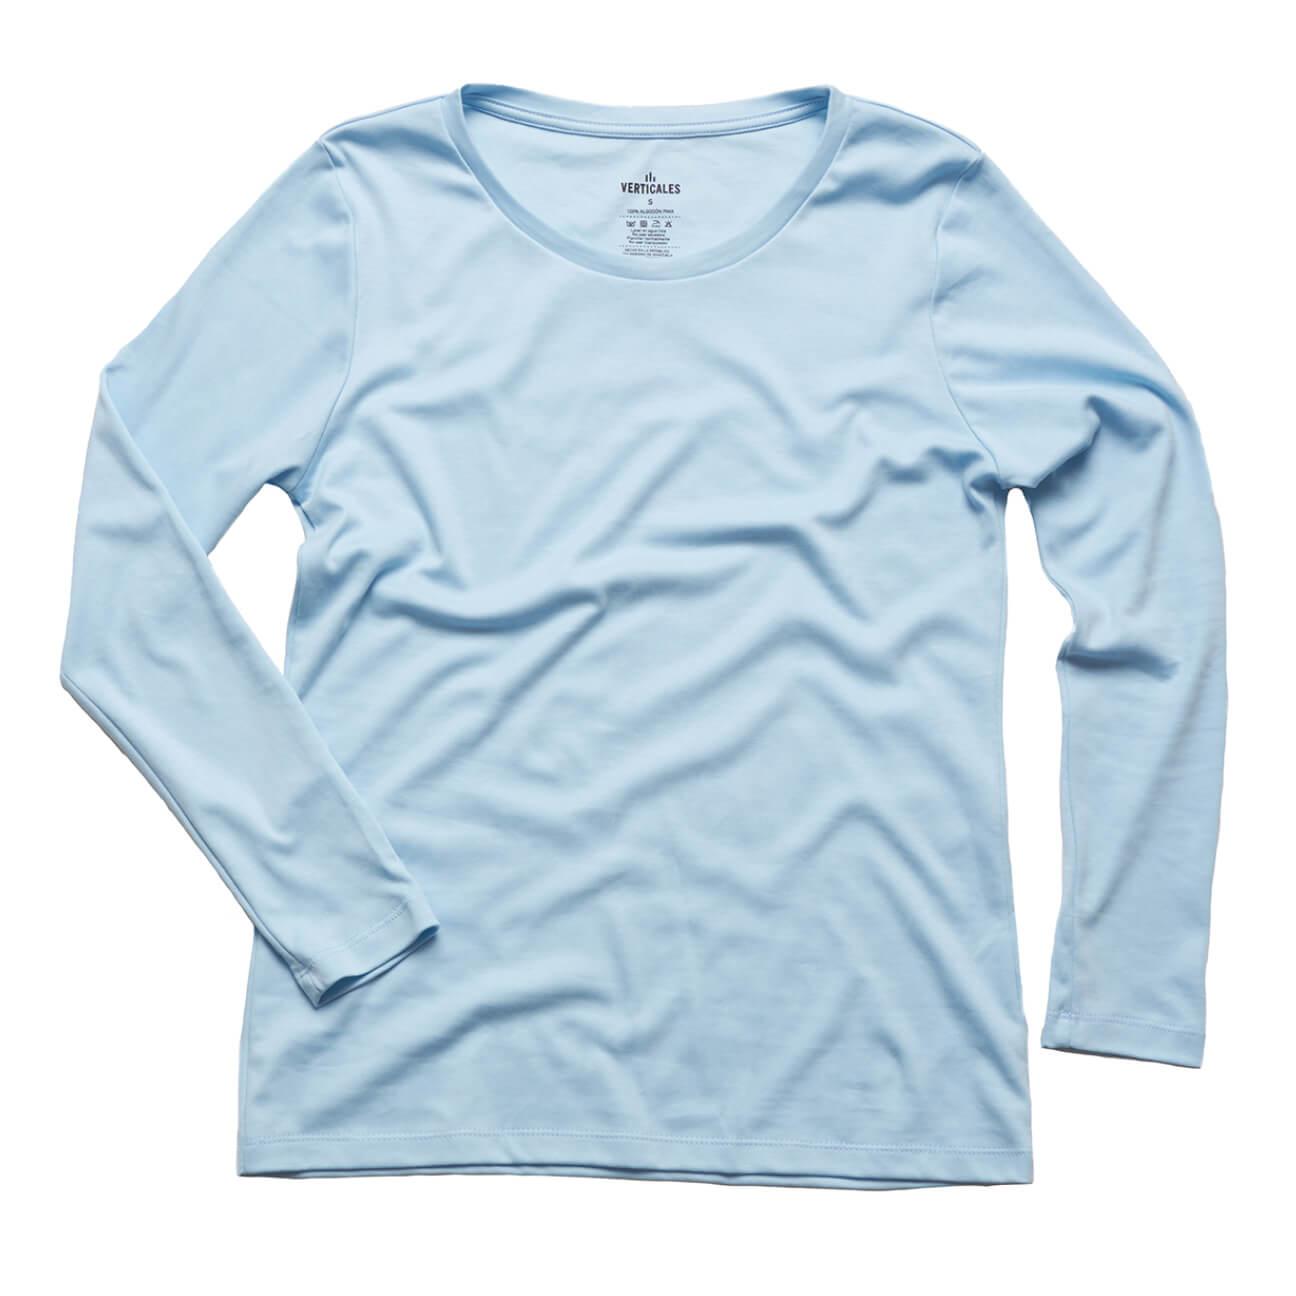 Franela basica Verticales dama manga larga azul claro